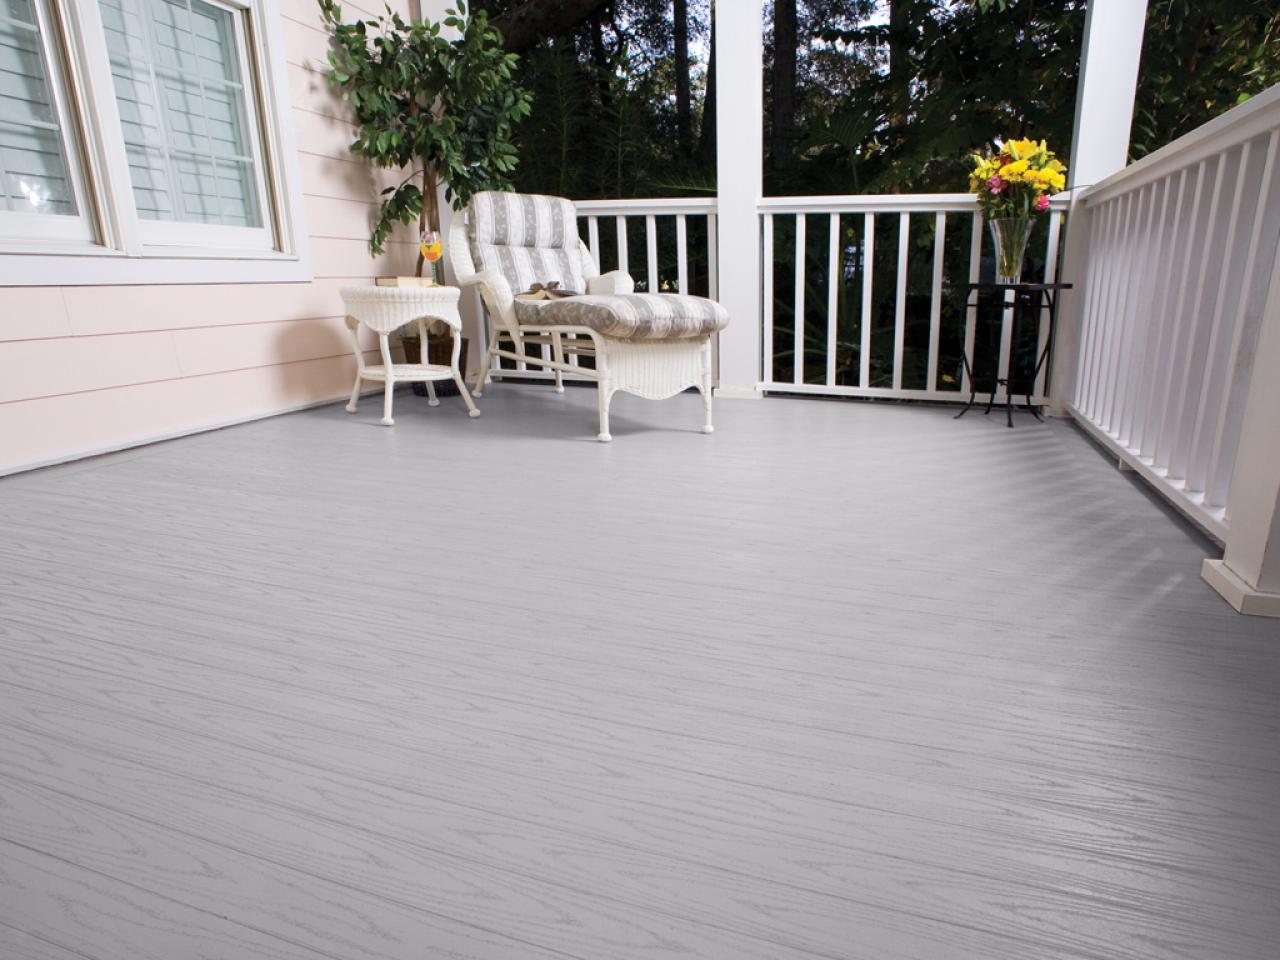 outdoor flooring options porch flooring and foundation DJSSUII